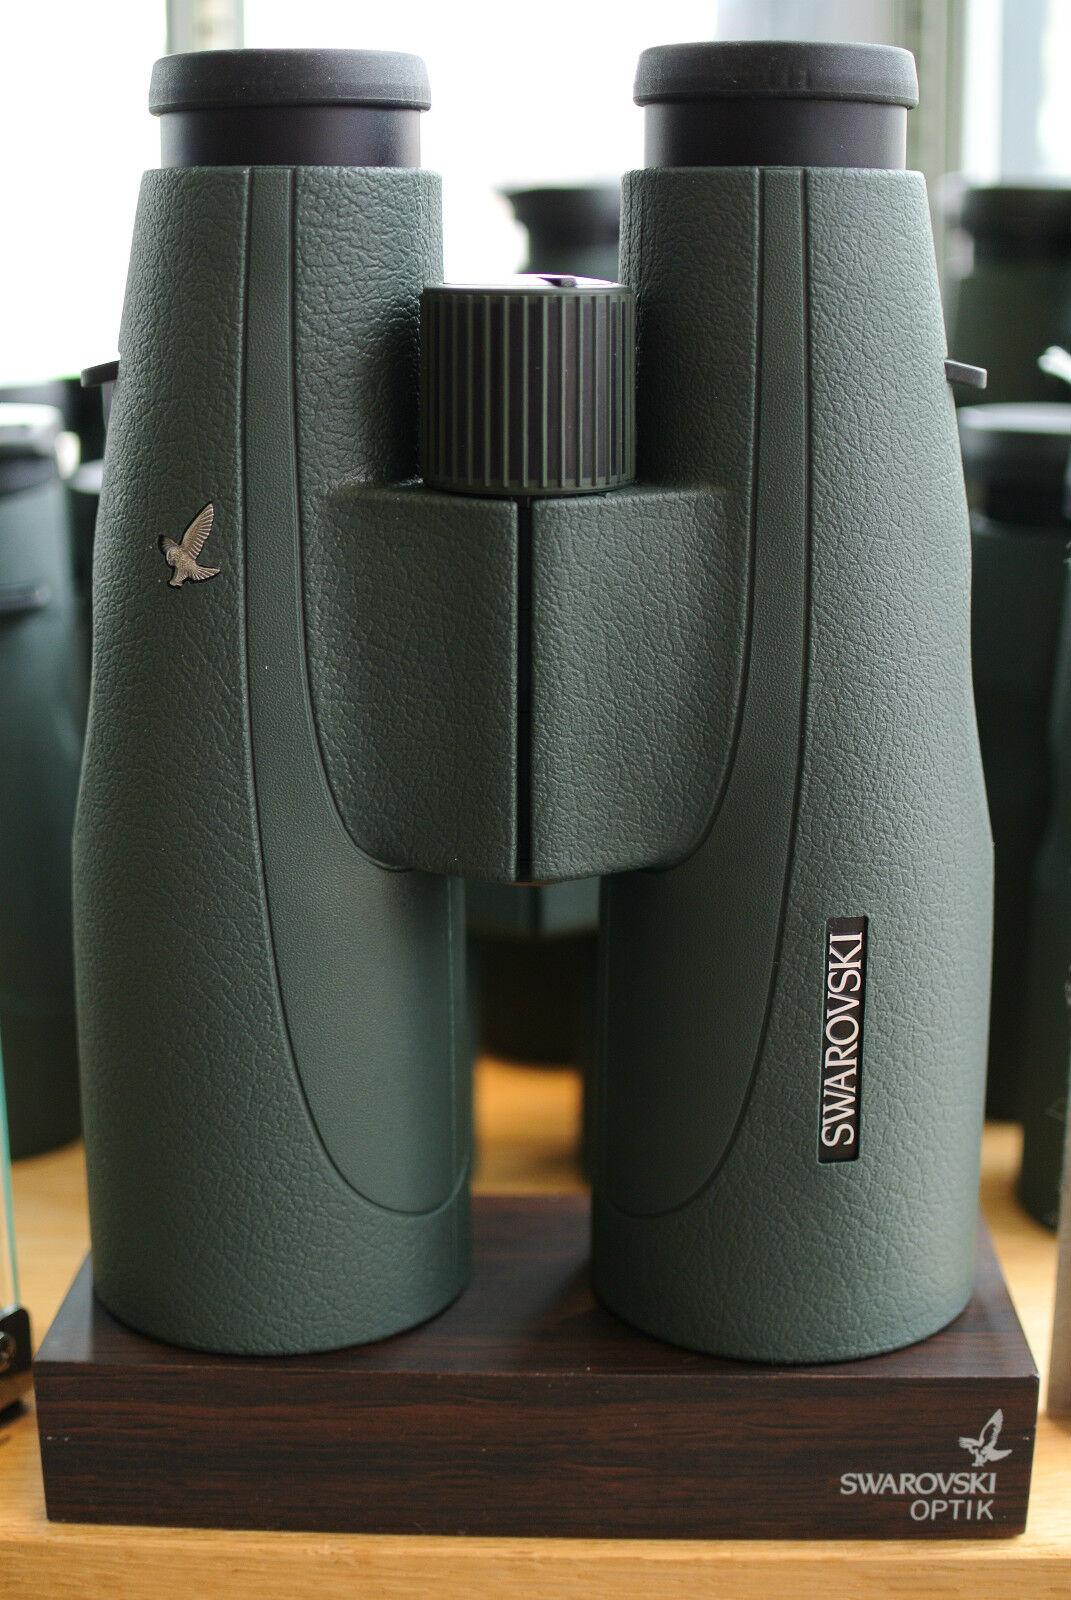 Swarovski 58291 SLC 15x56 WB HD Binoculars Roof Prism Armore